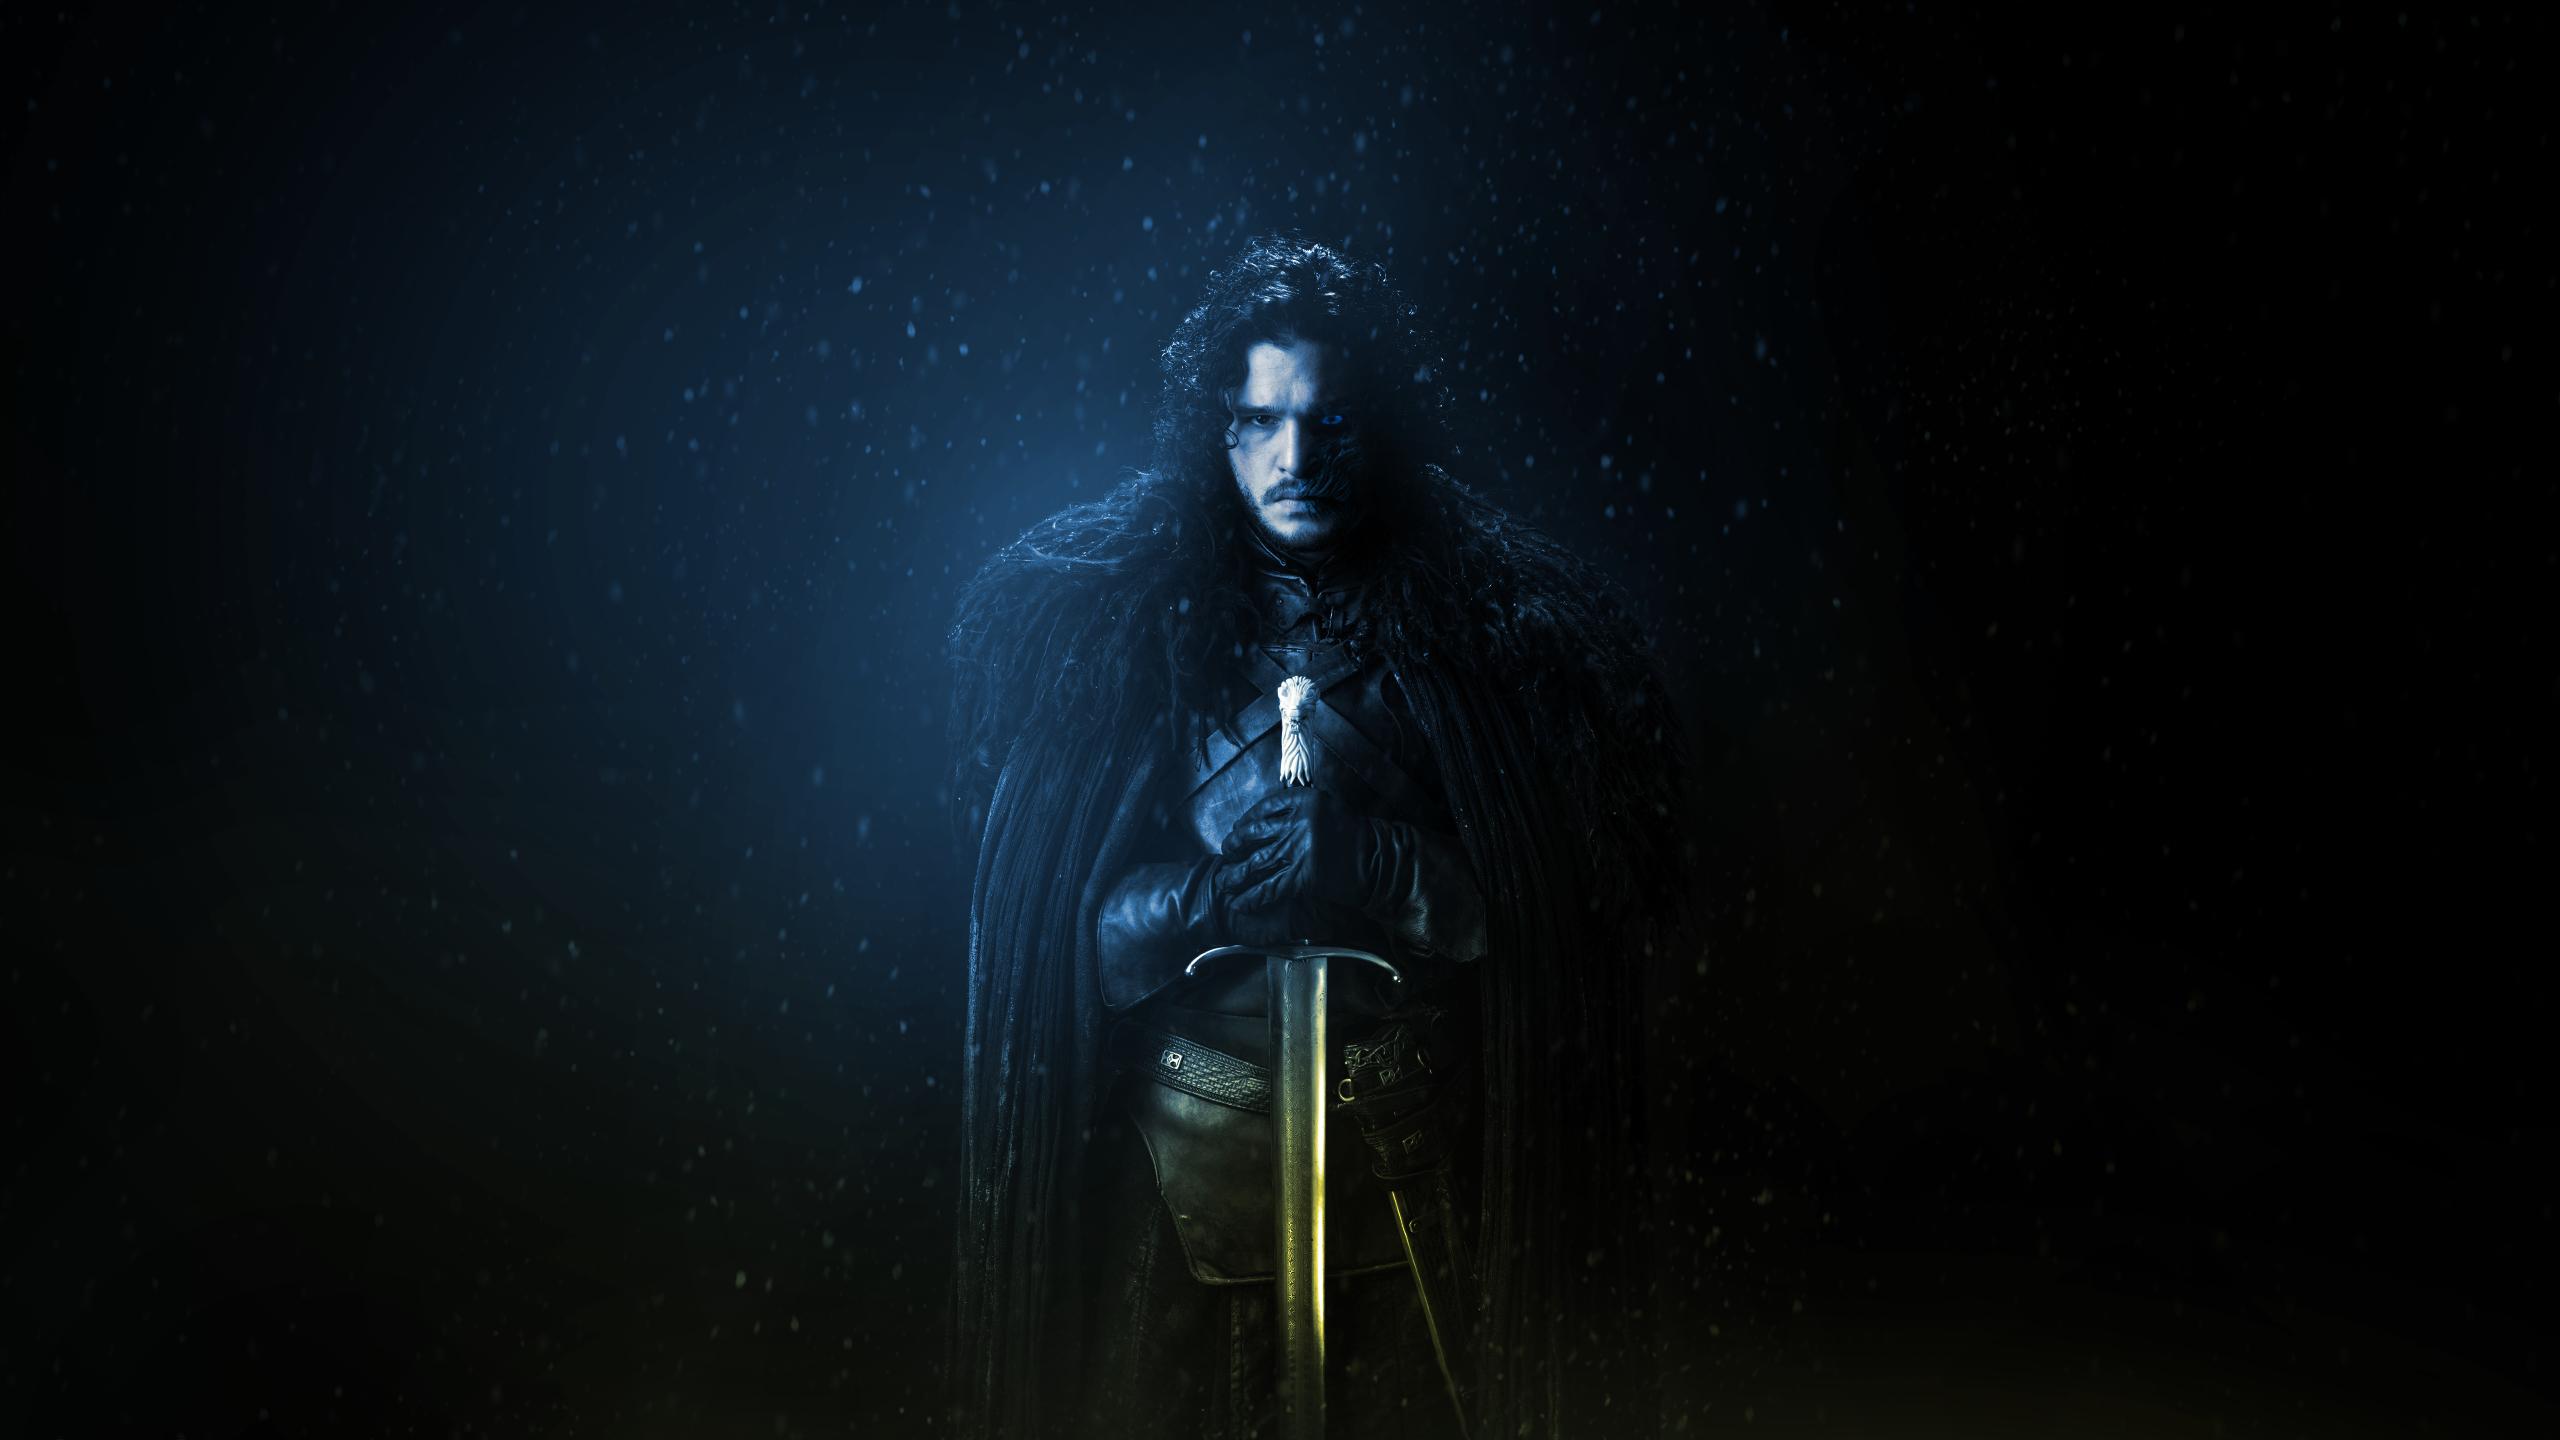 Jon Snow Game of Thrones sword TV Kit Harington wallpaper 2560x1440